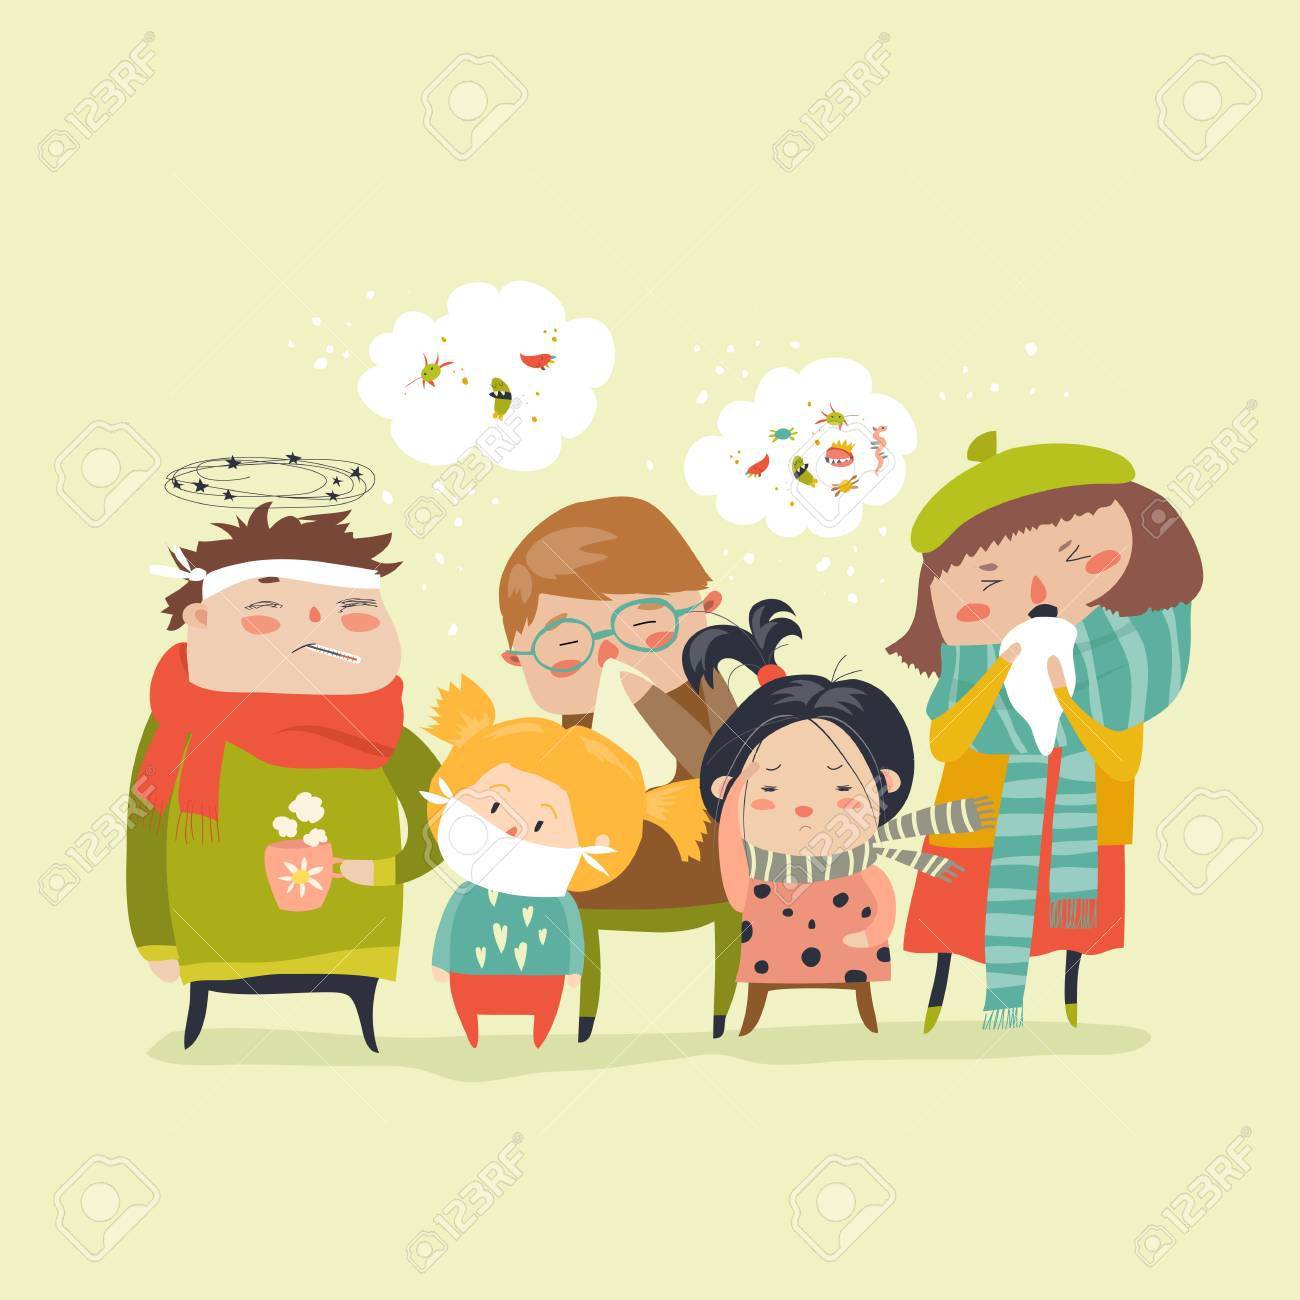 Sick children with fever, illness Vector illustration. - 92246980